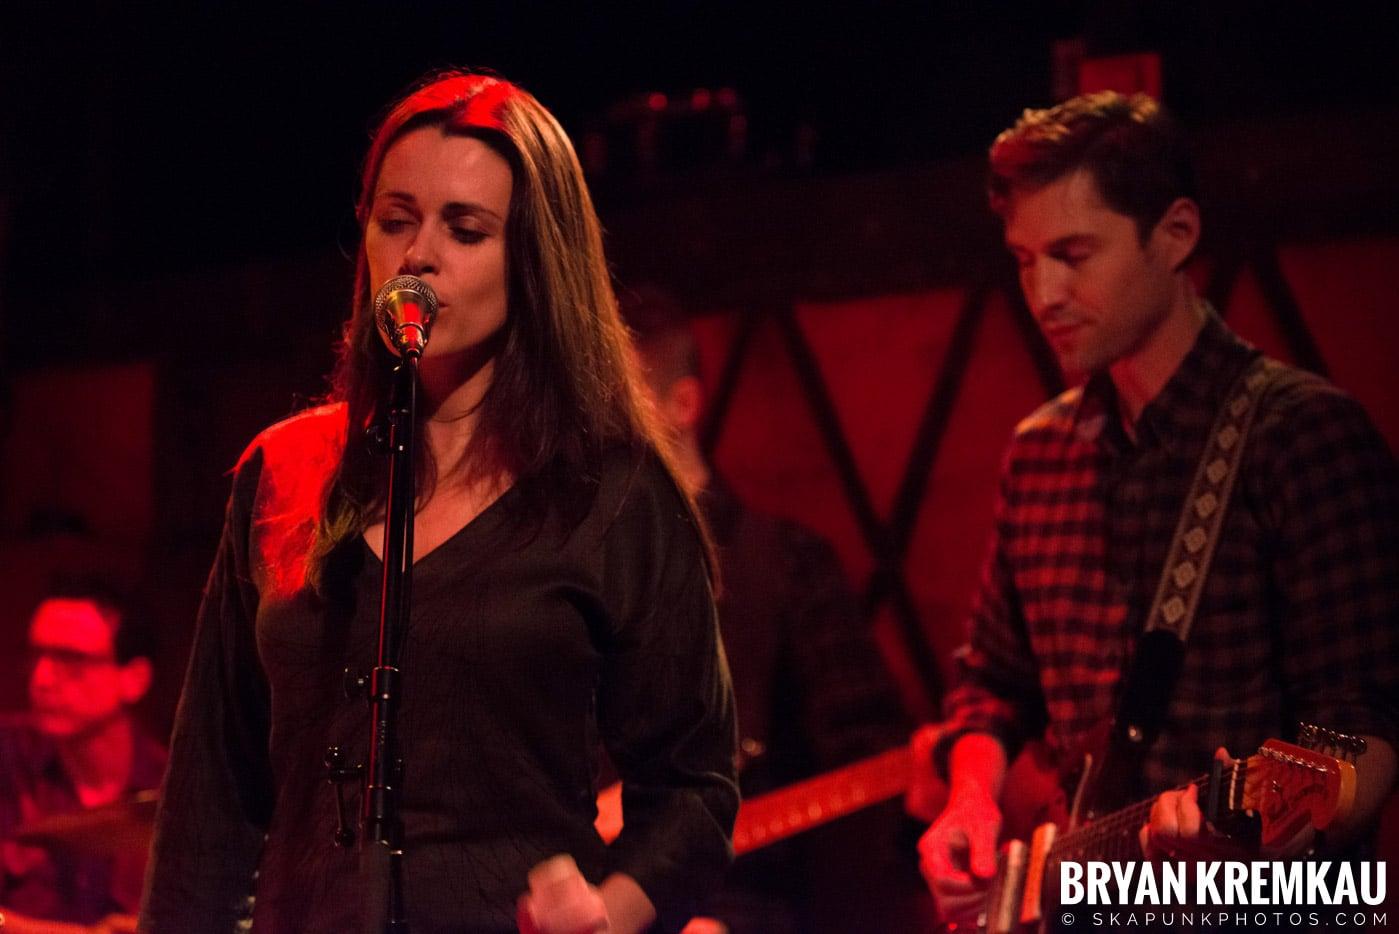 Peter Bradley Adams @ Rockwood Music Hall, NYC - 3.9.13 (8)